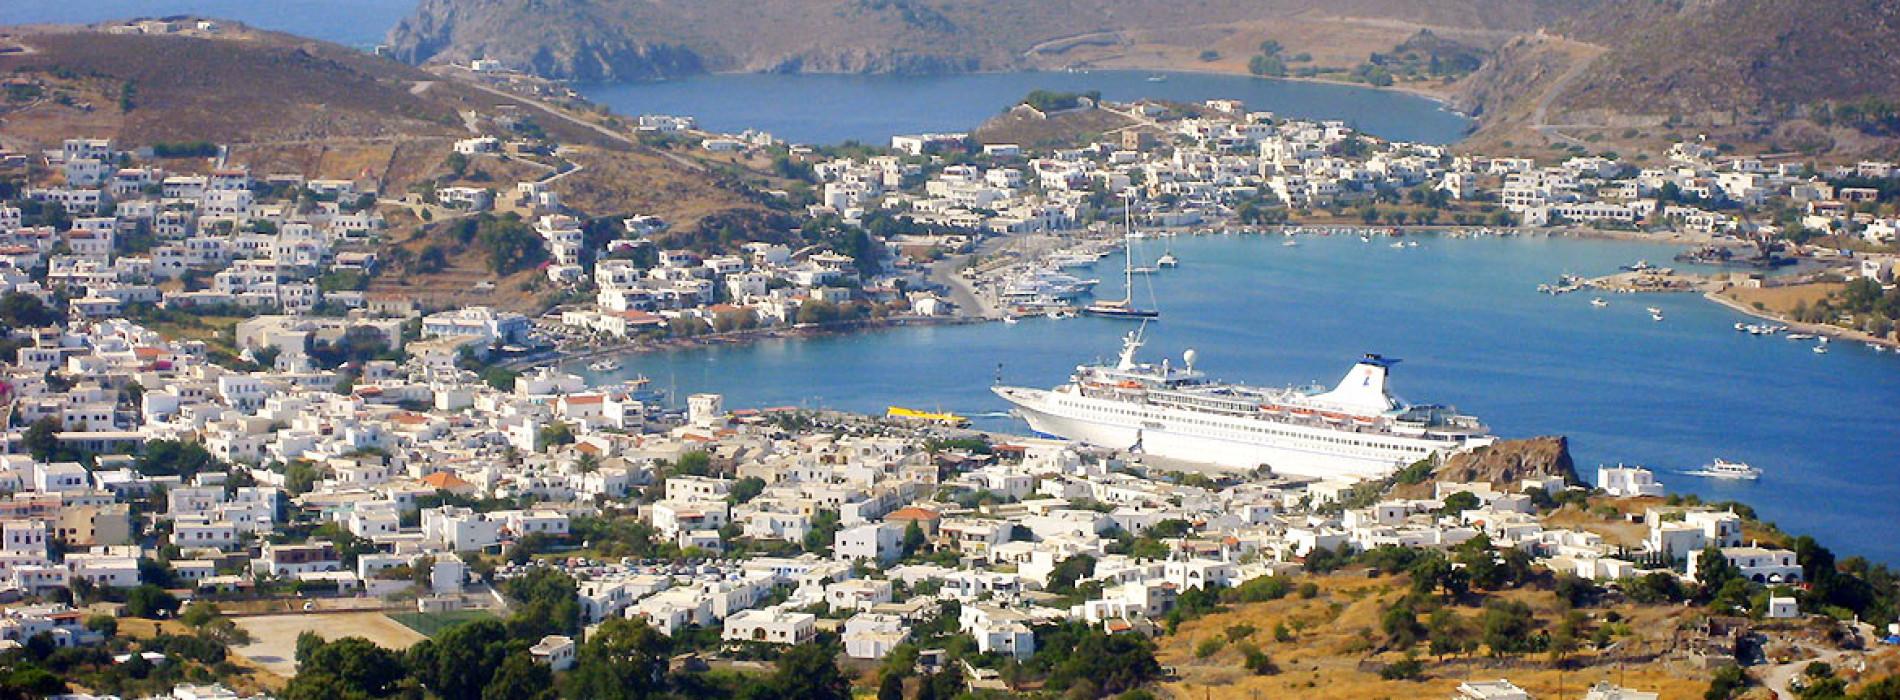 Port of Skala – Life center of the island